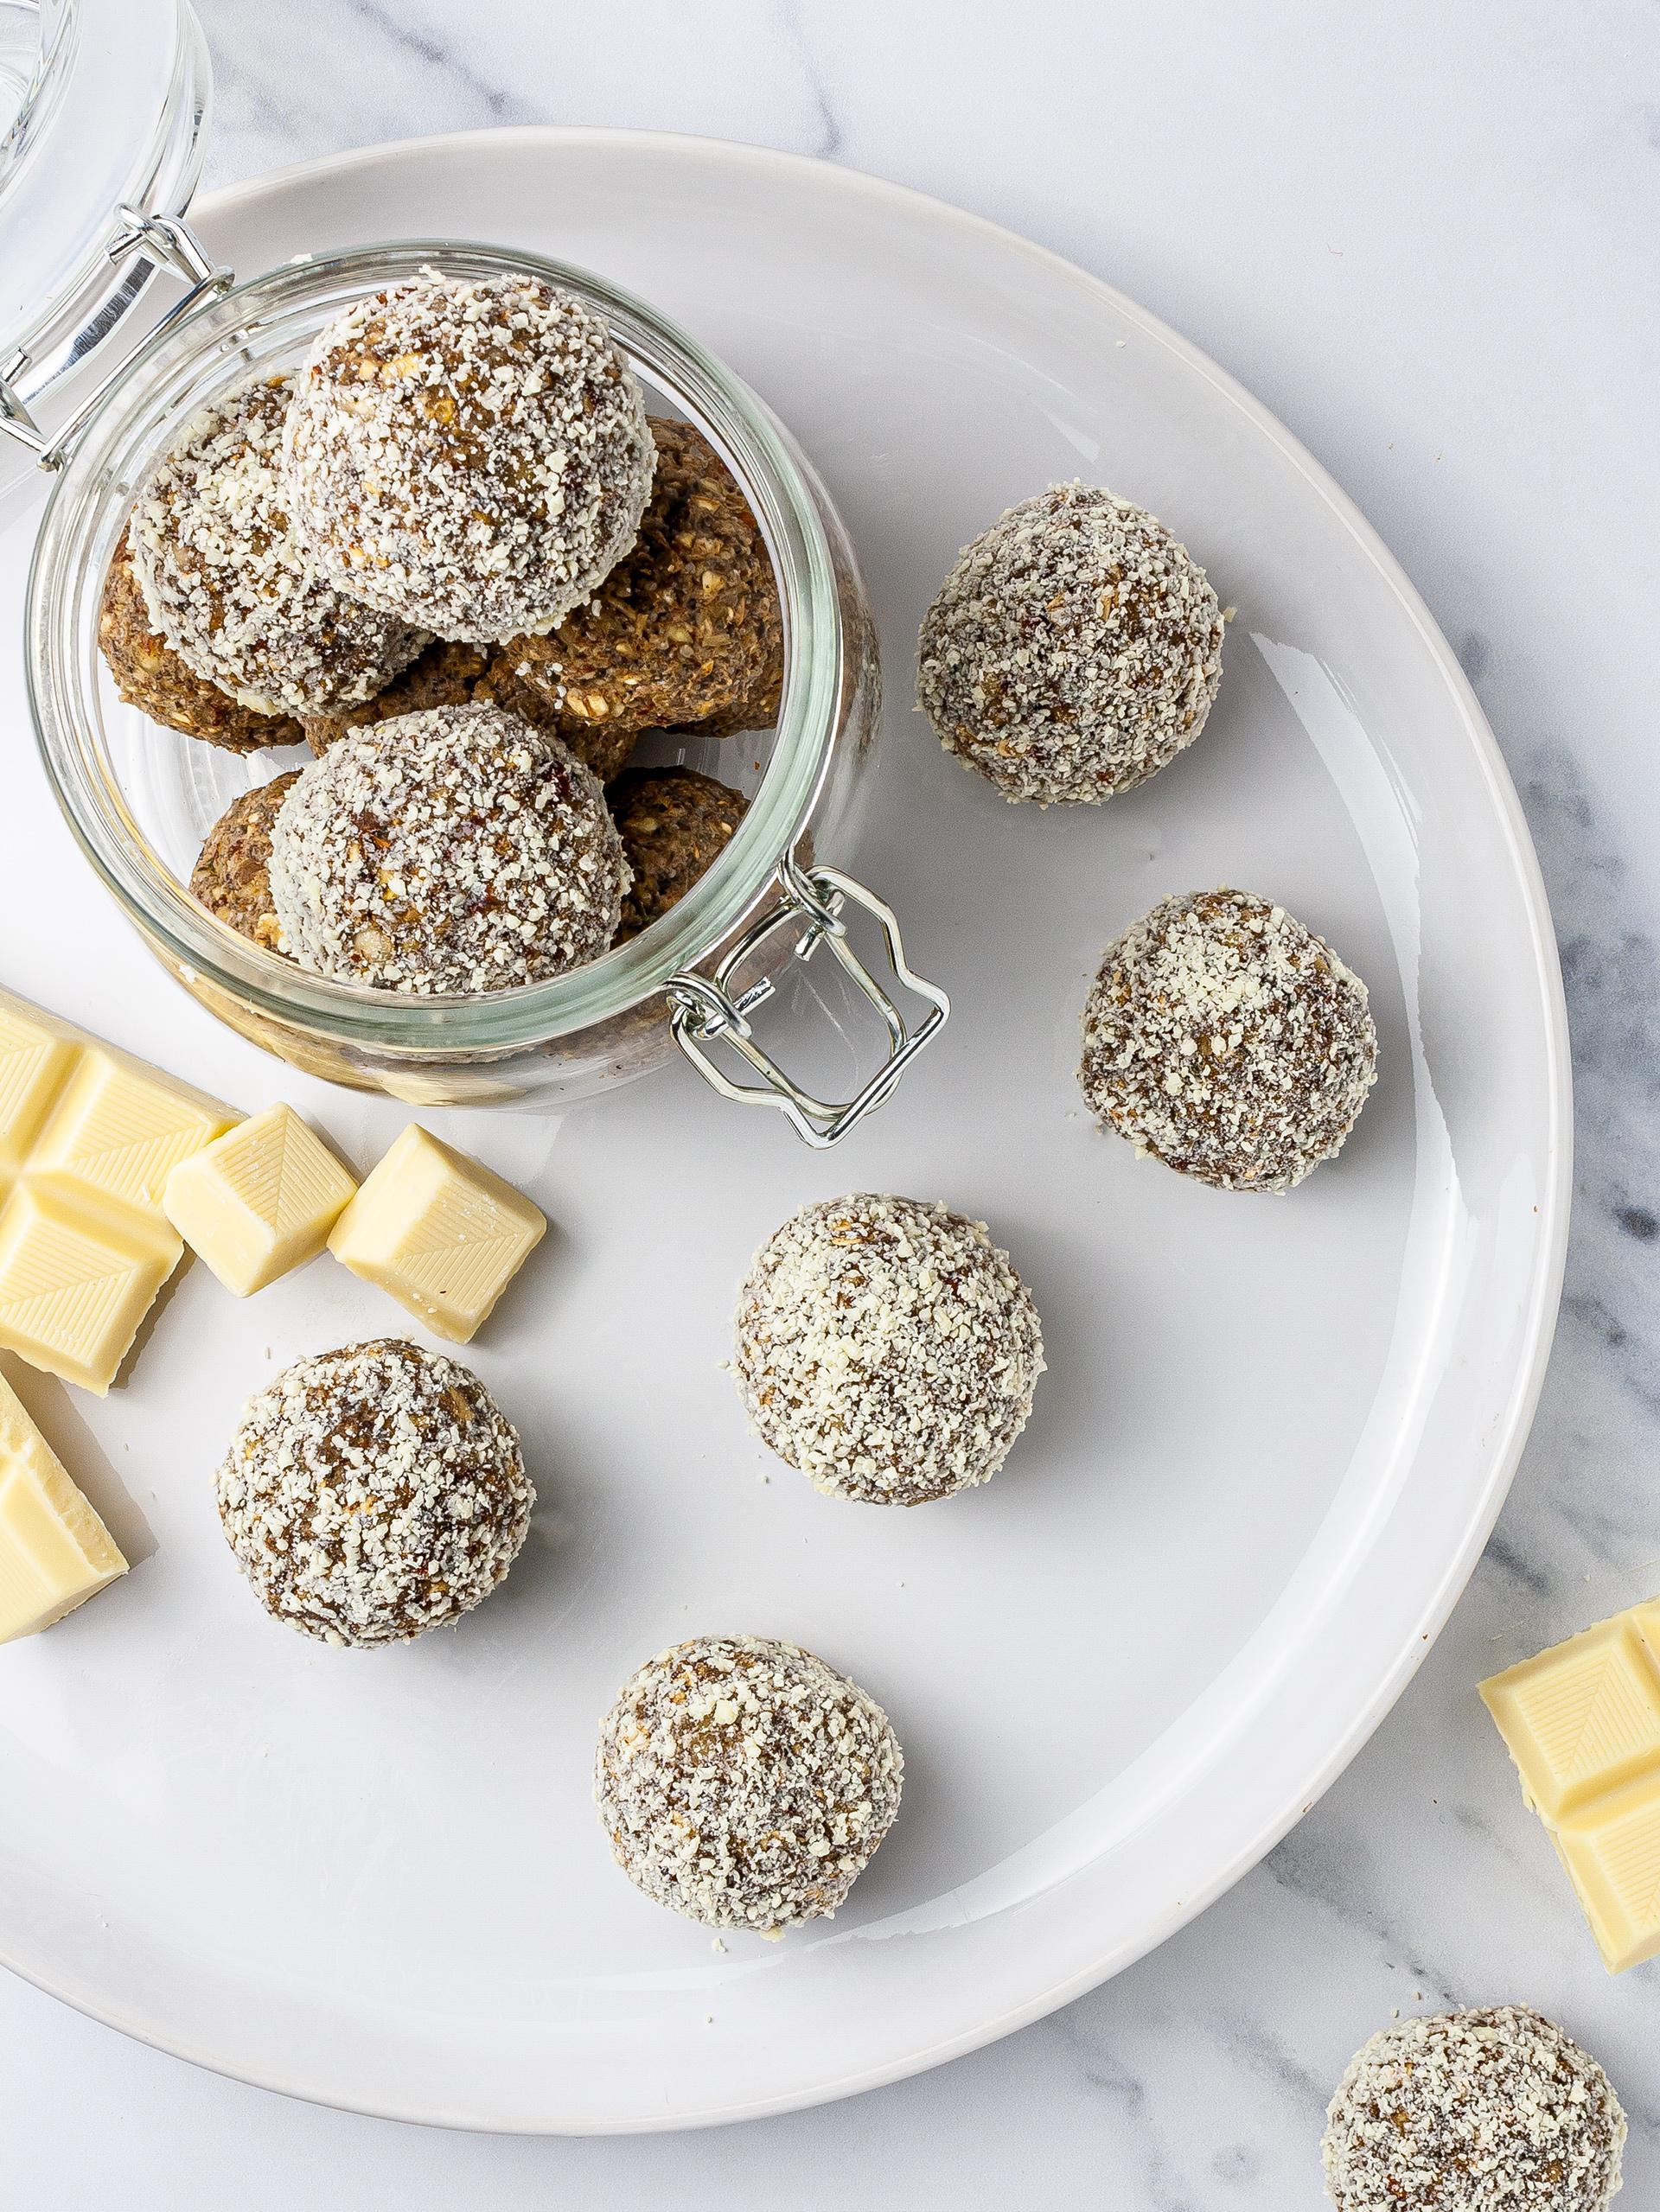 White Chocolate Protein Balls with Hemp Seeds Recipe Thumbnail